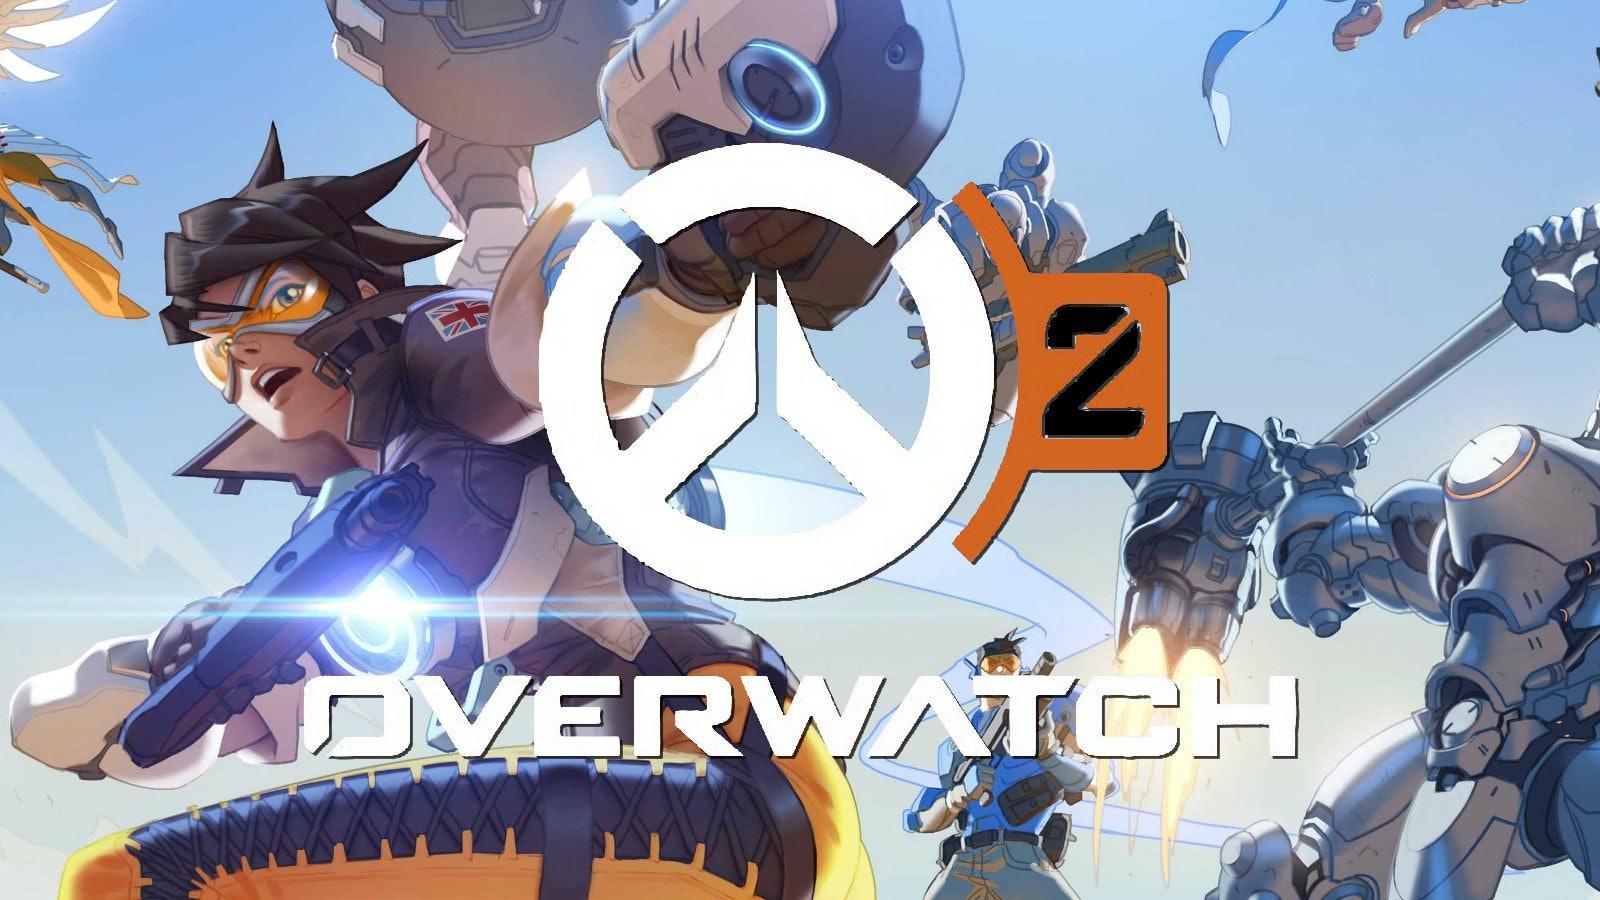 overwatch 2 leaked logo